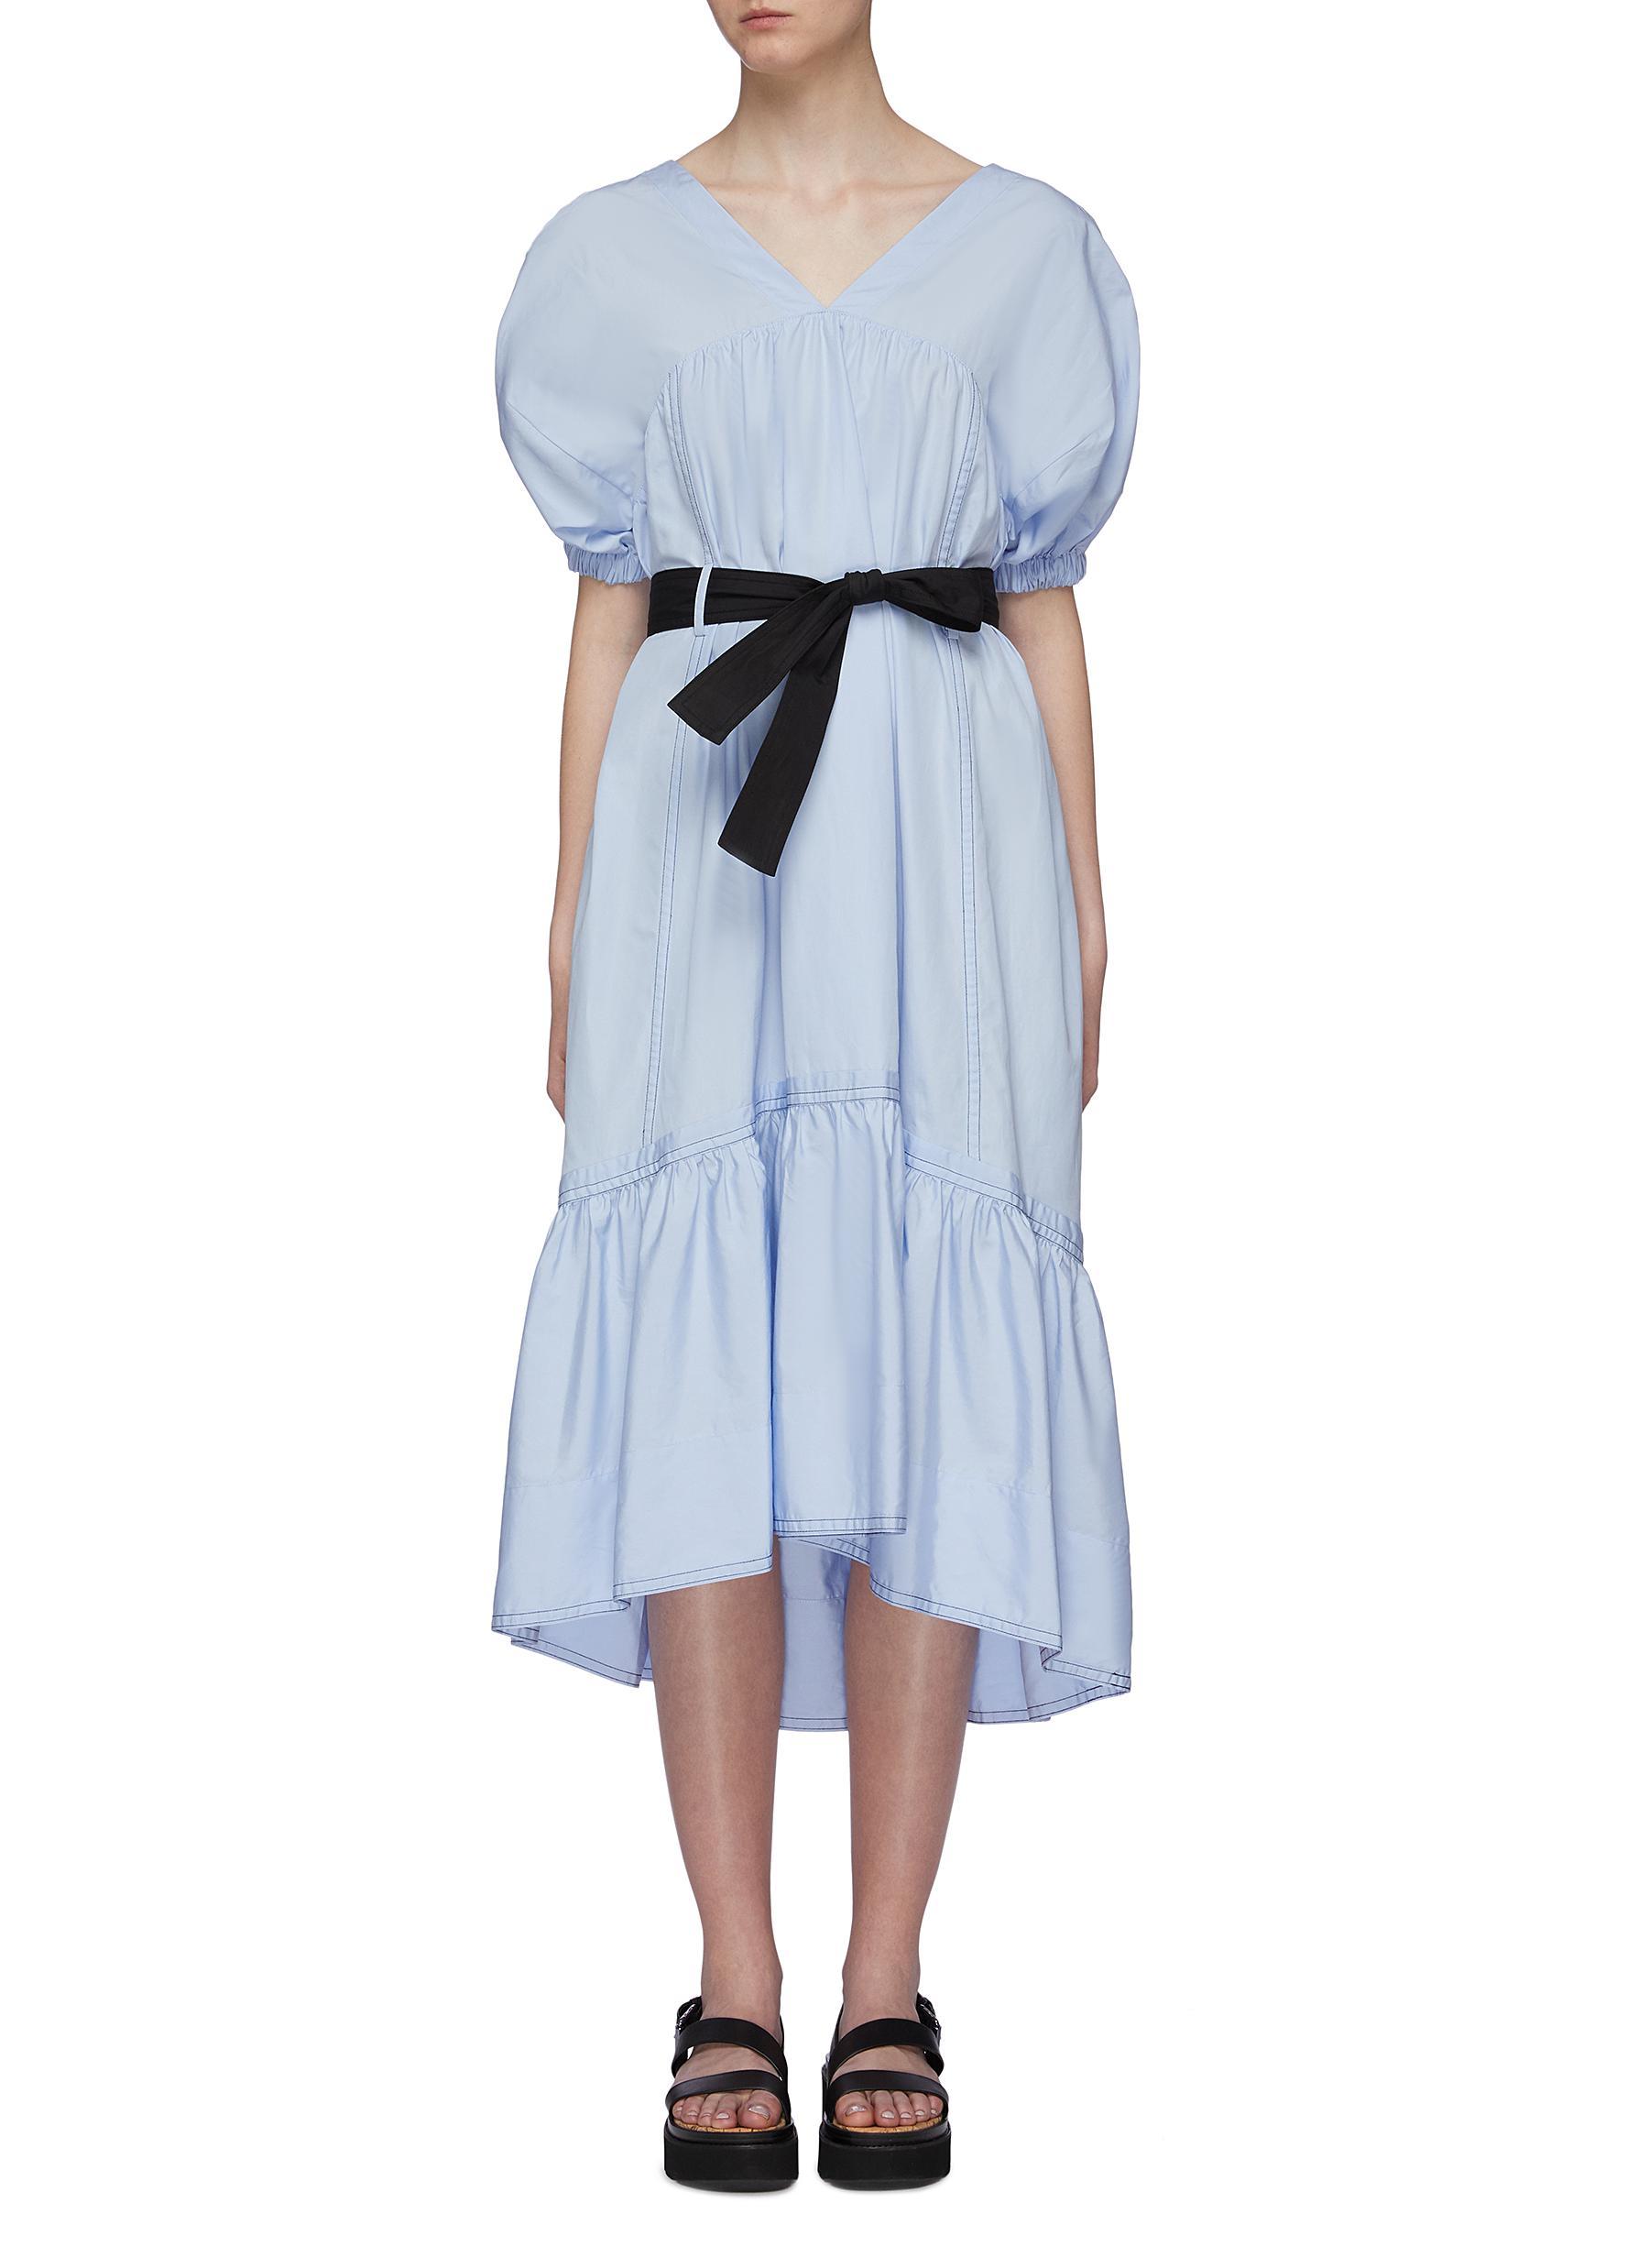 Belted puff sleeve cutout back peplum midi dress by 3.1 Phillip Lim